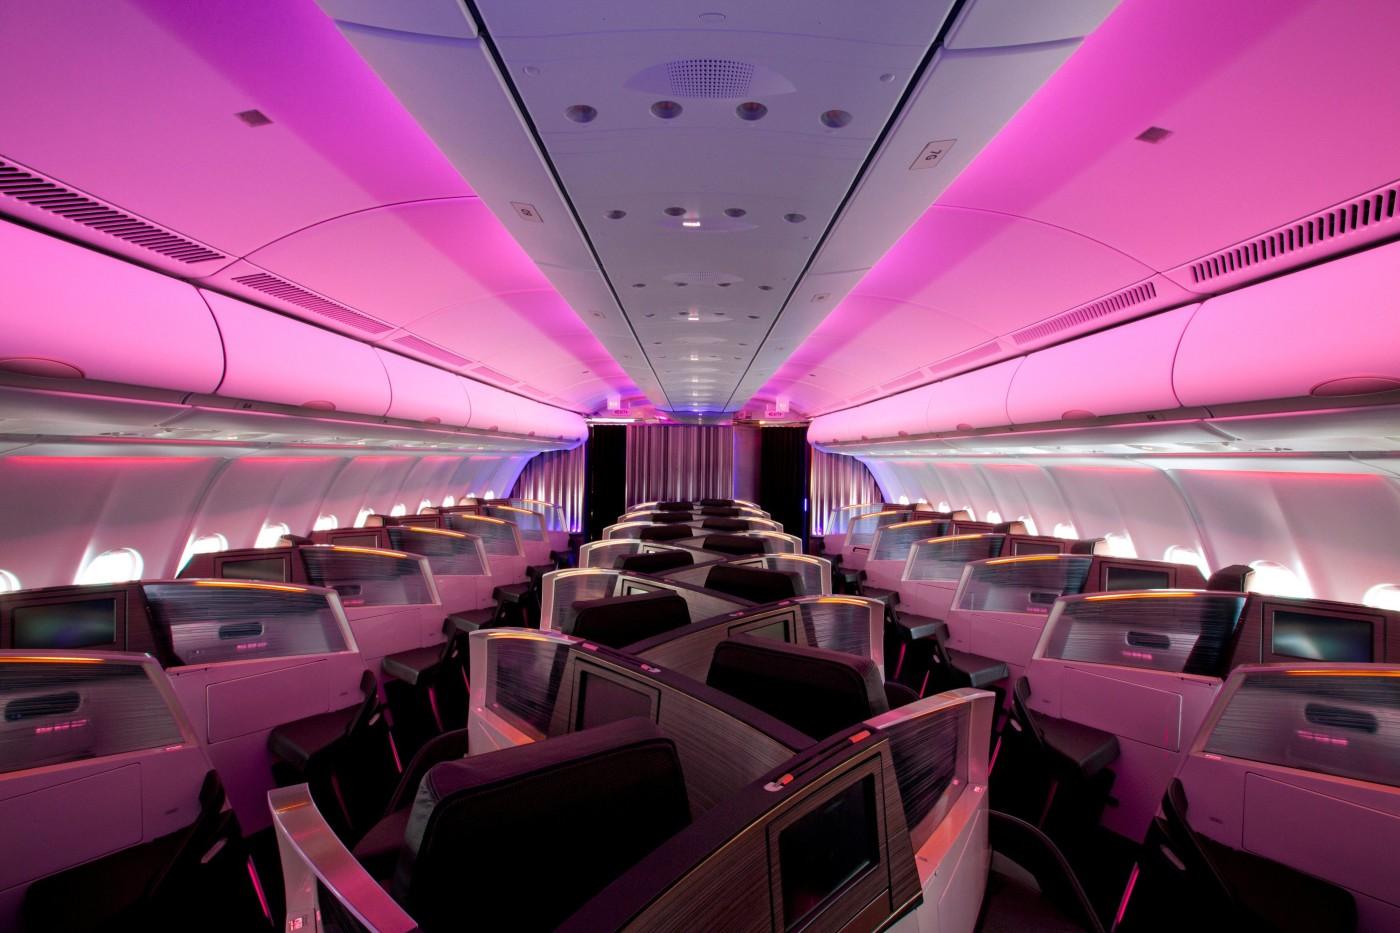 Virgin Atlantic Upgrade >> Virgin Atlantic's Flying Club: The Ultimate Guide | LoungeBuddy